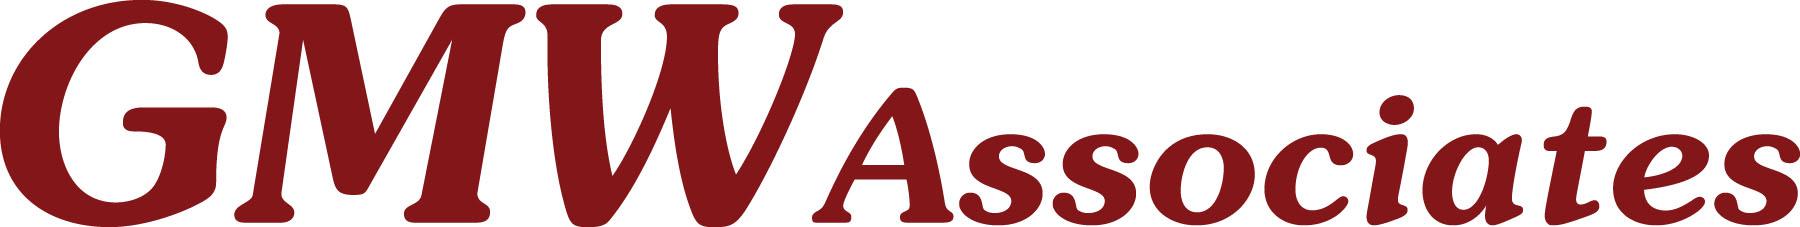 GMWAssociates-Logo-Red-6inch-300dpi.jpg